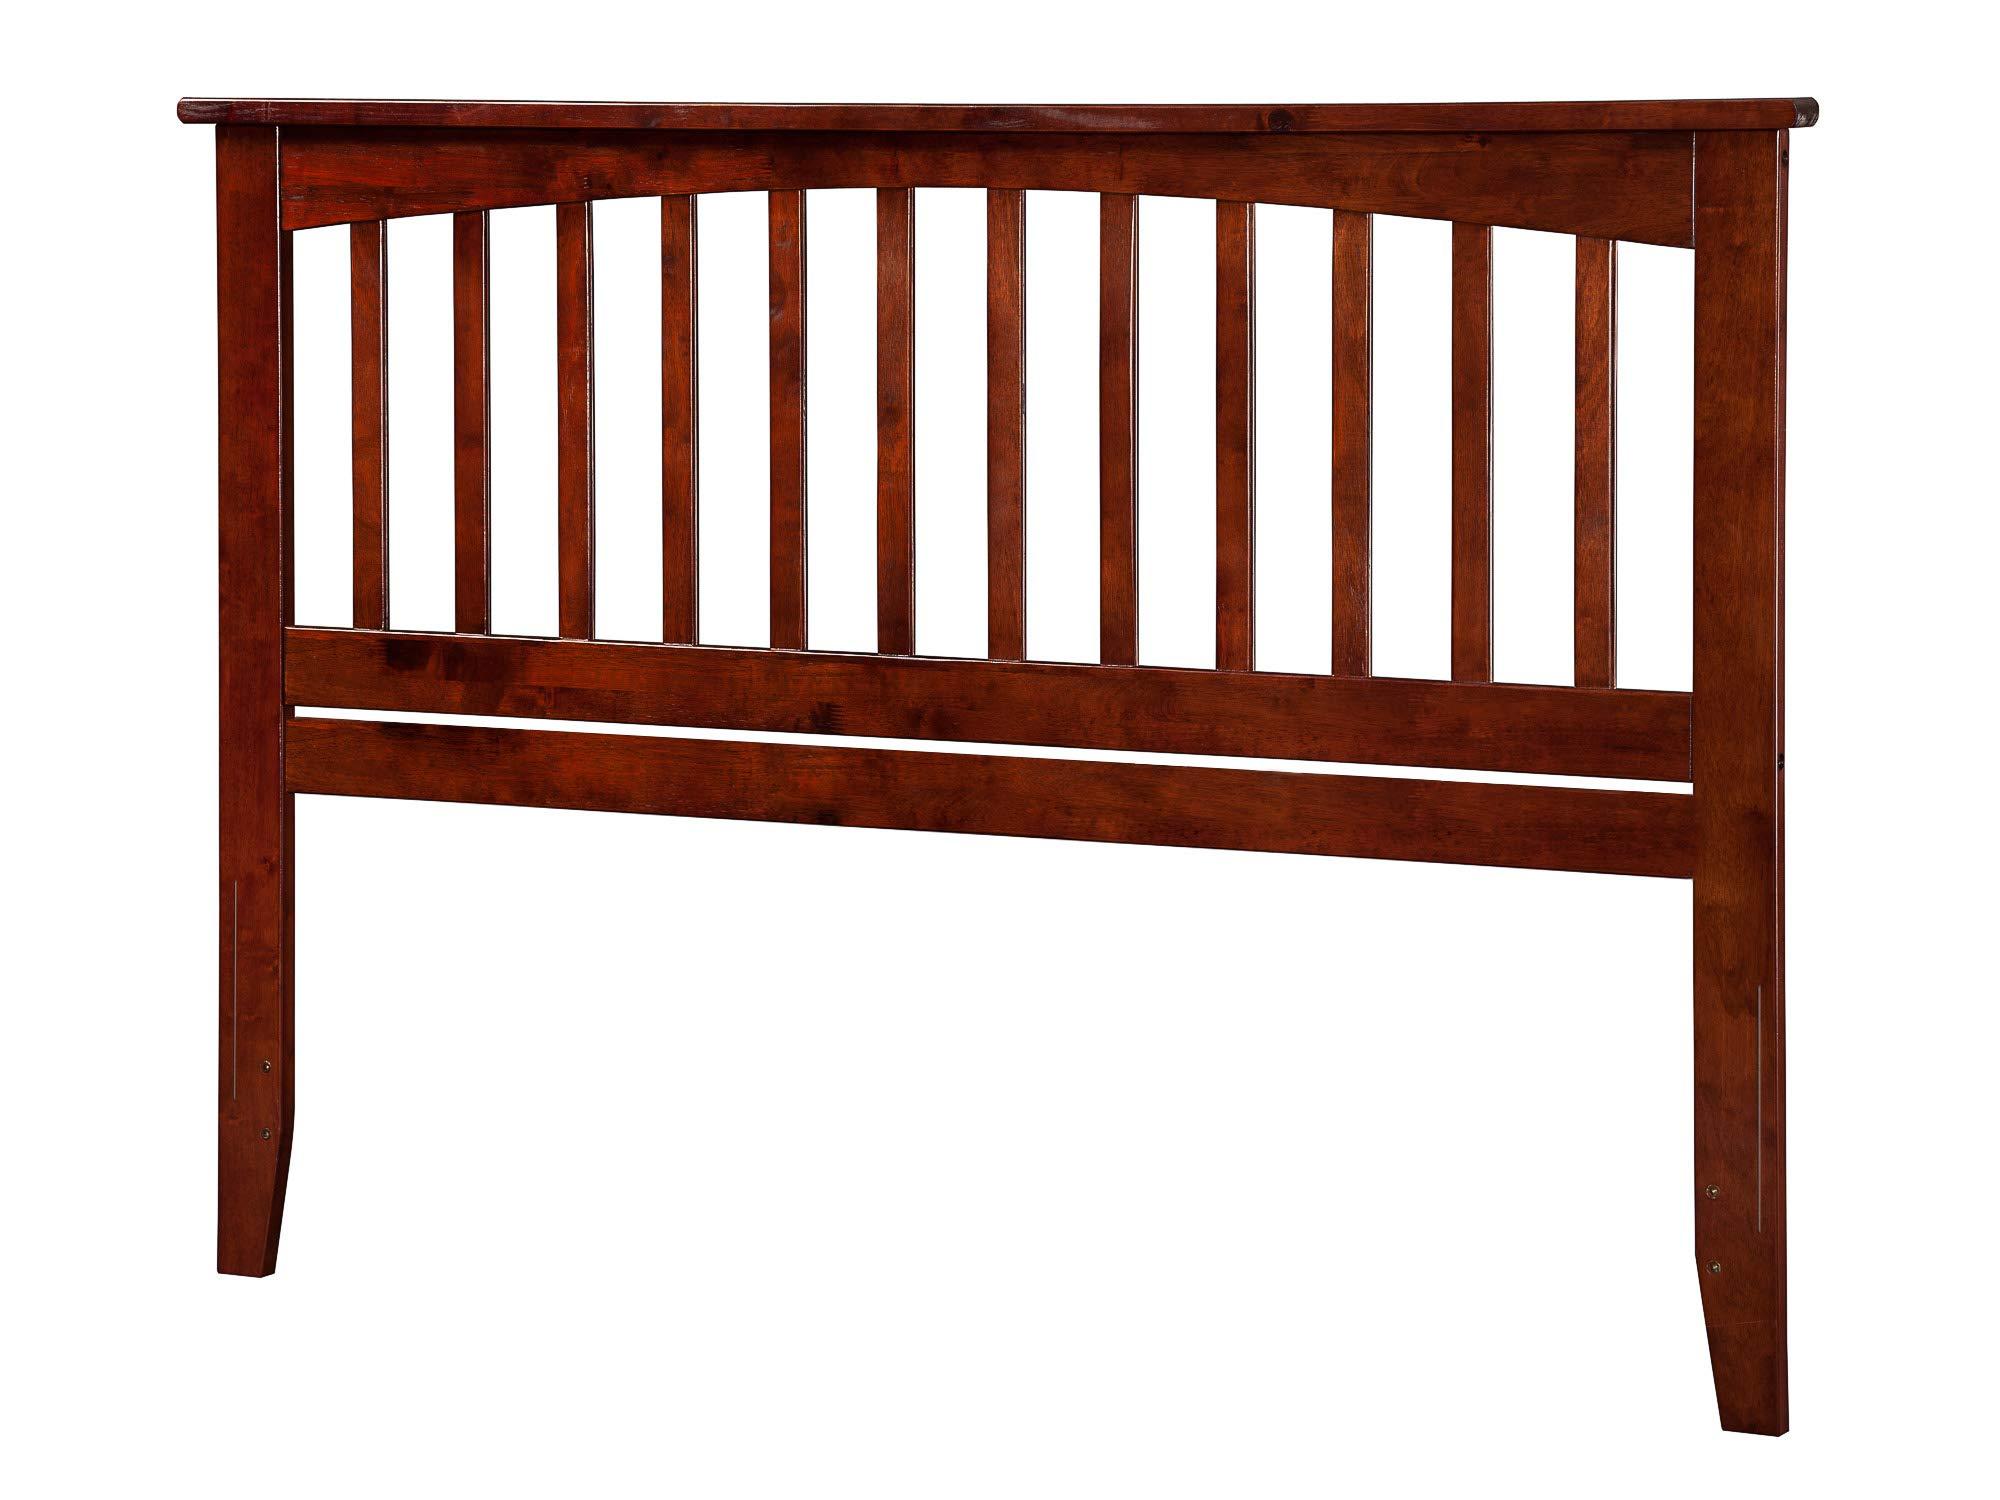 Atlantic Furniture AR287844 Mission Headboard, Queen, Walnut by Atlantic Furniture